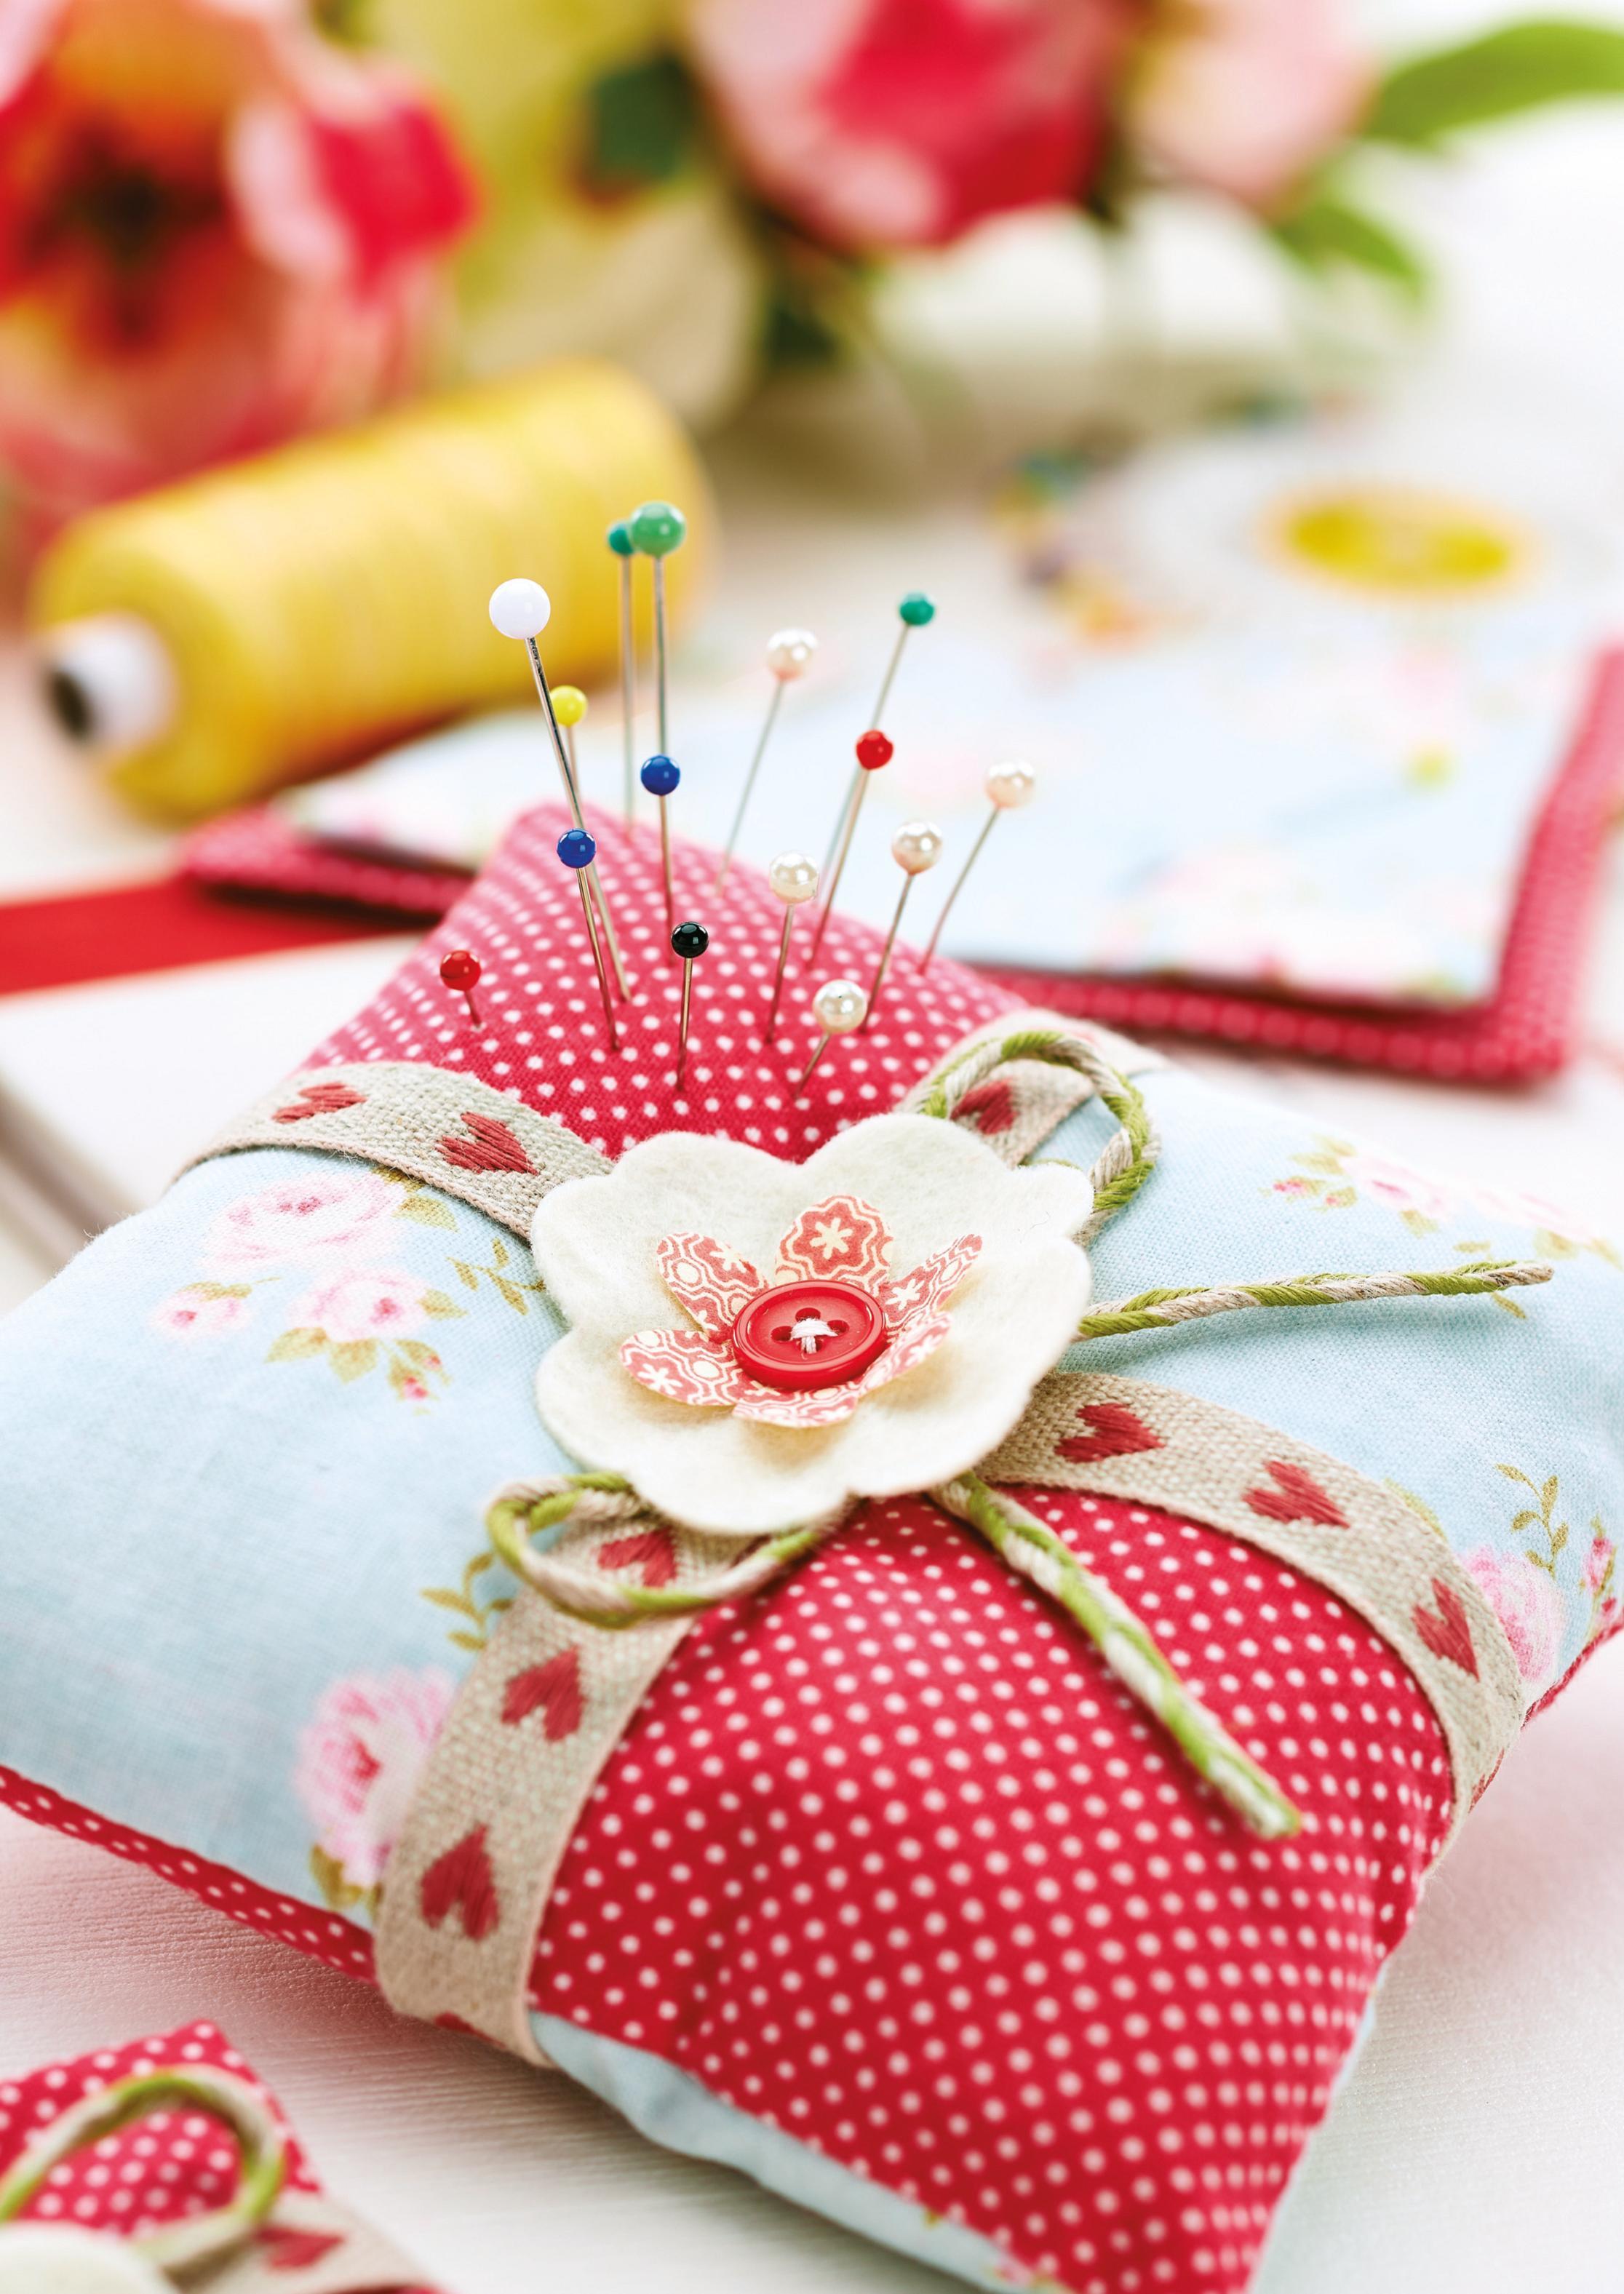 Картинки для шитья на ткани